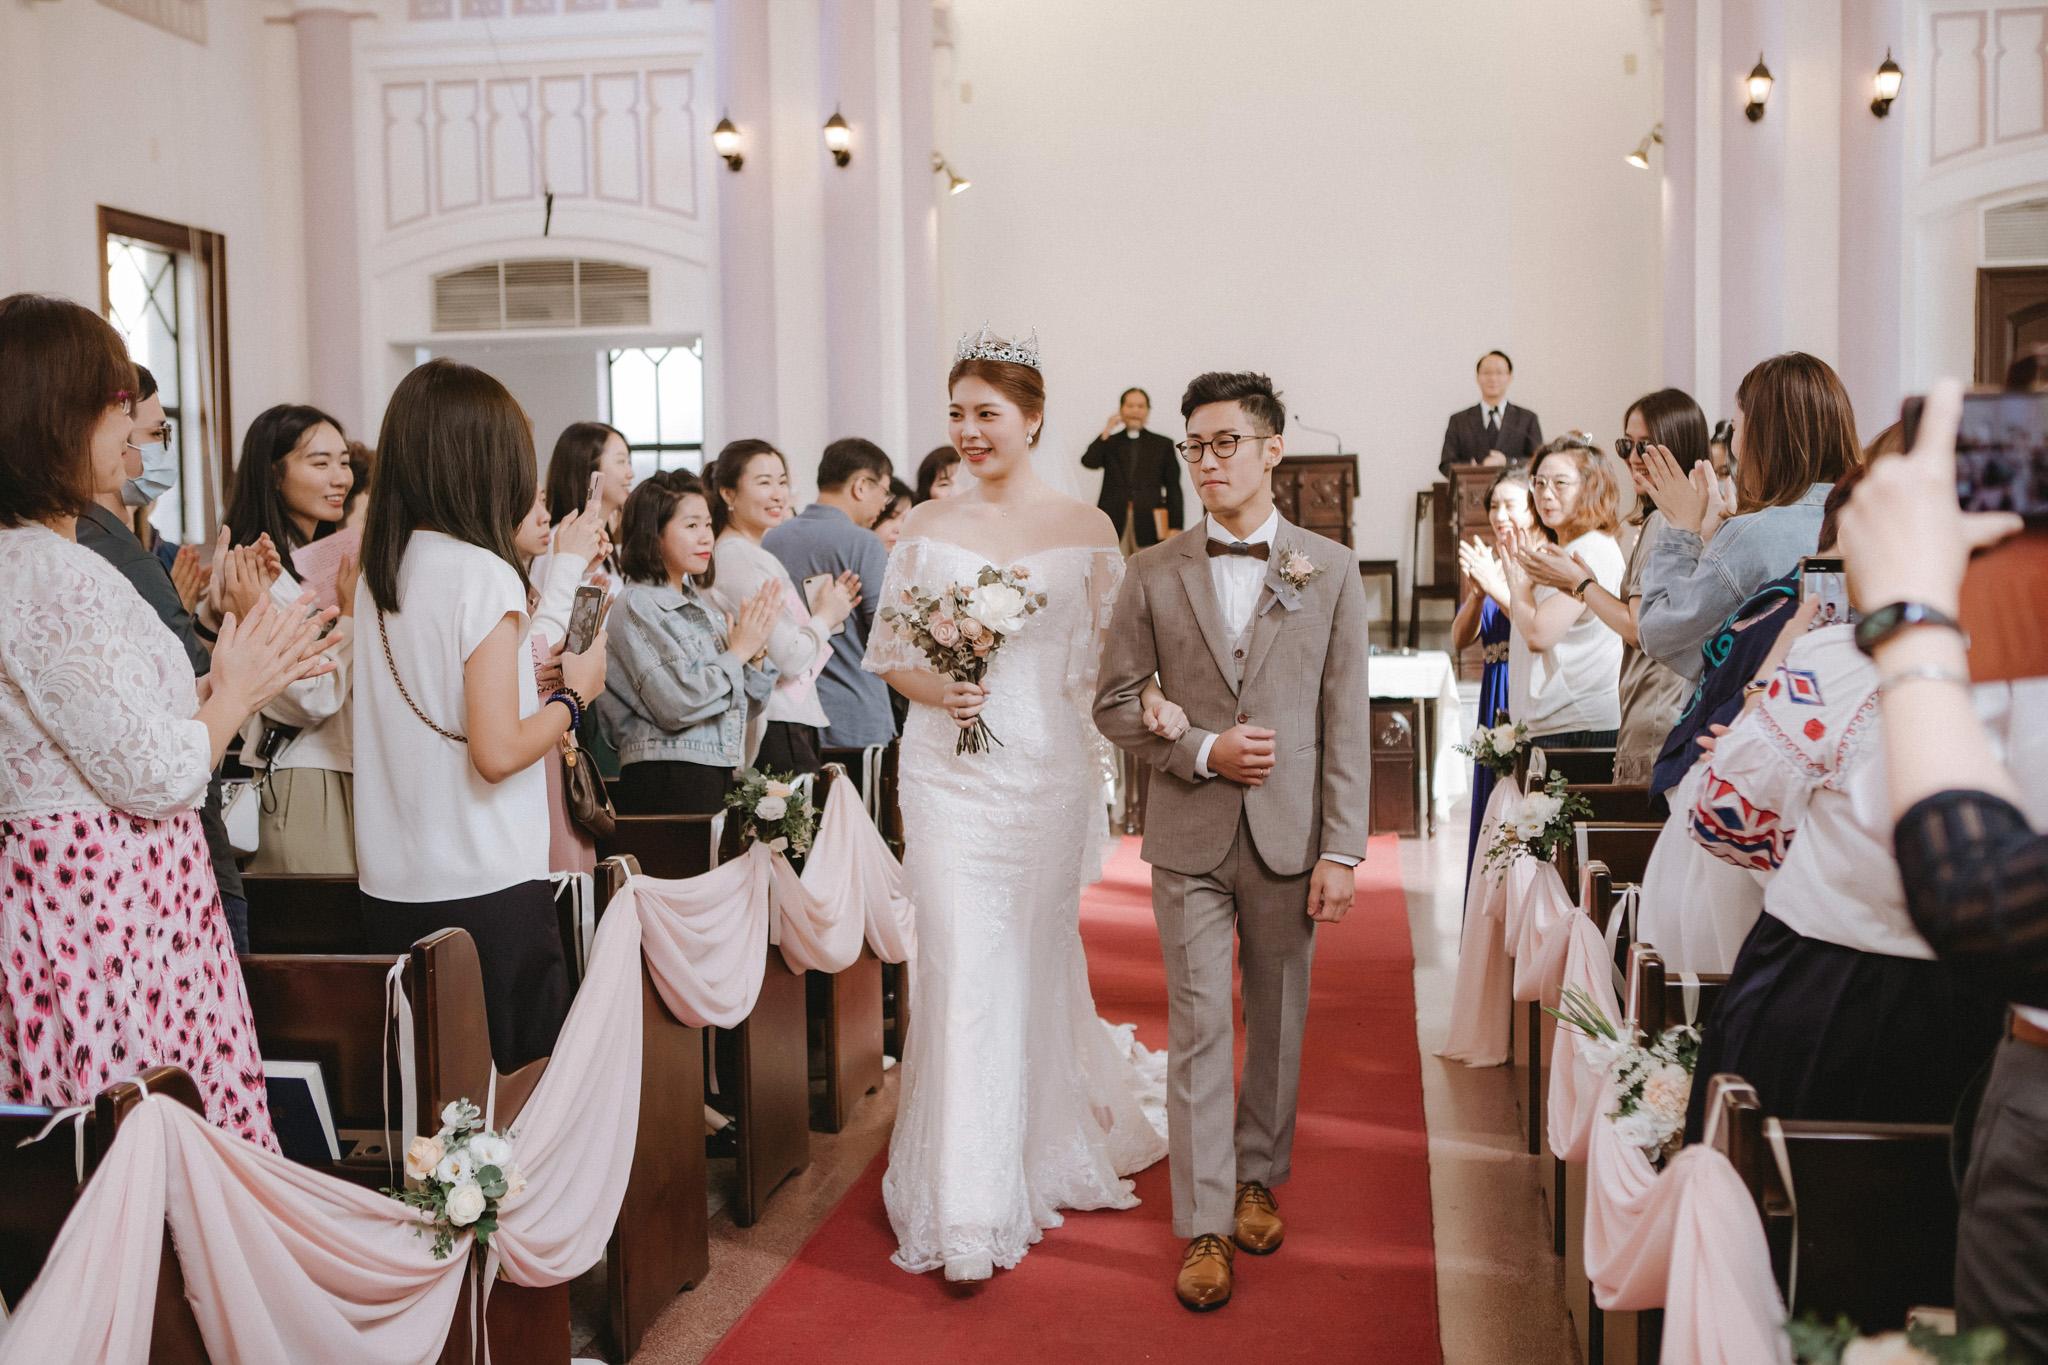 EW 台北婚攝 居米 濟南教會 Brick Yard 33 美軍俱樂部 婚禮 婚宴-48